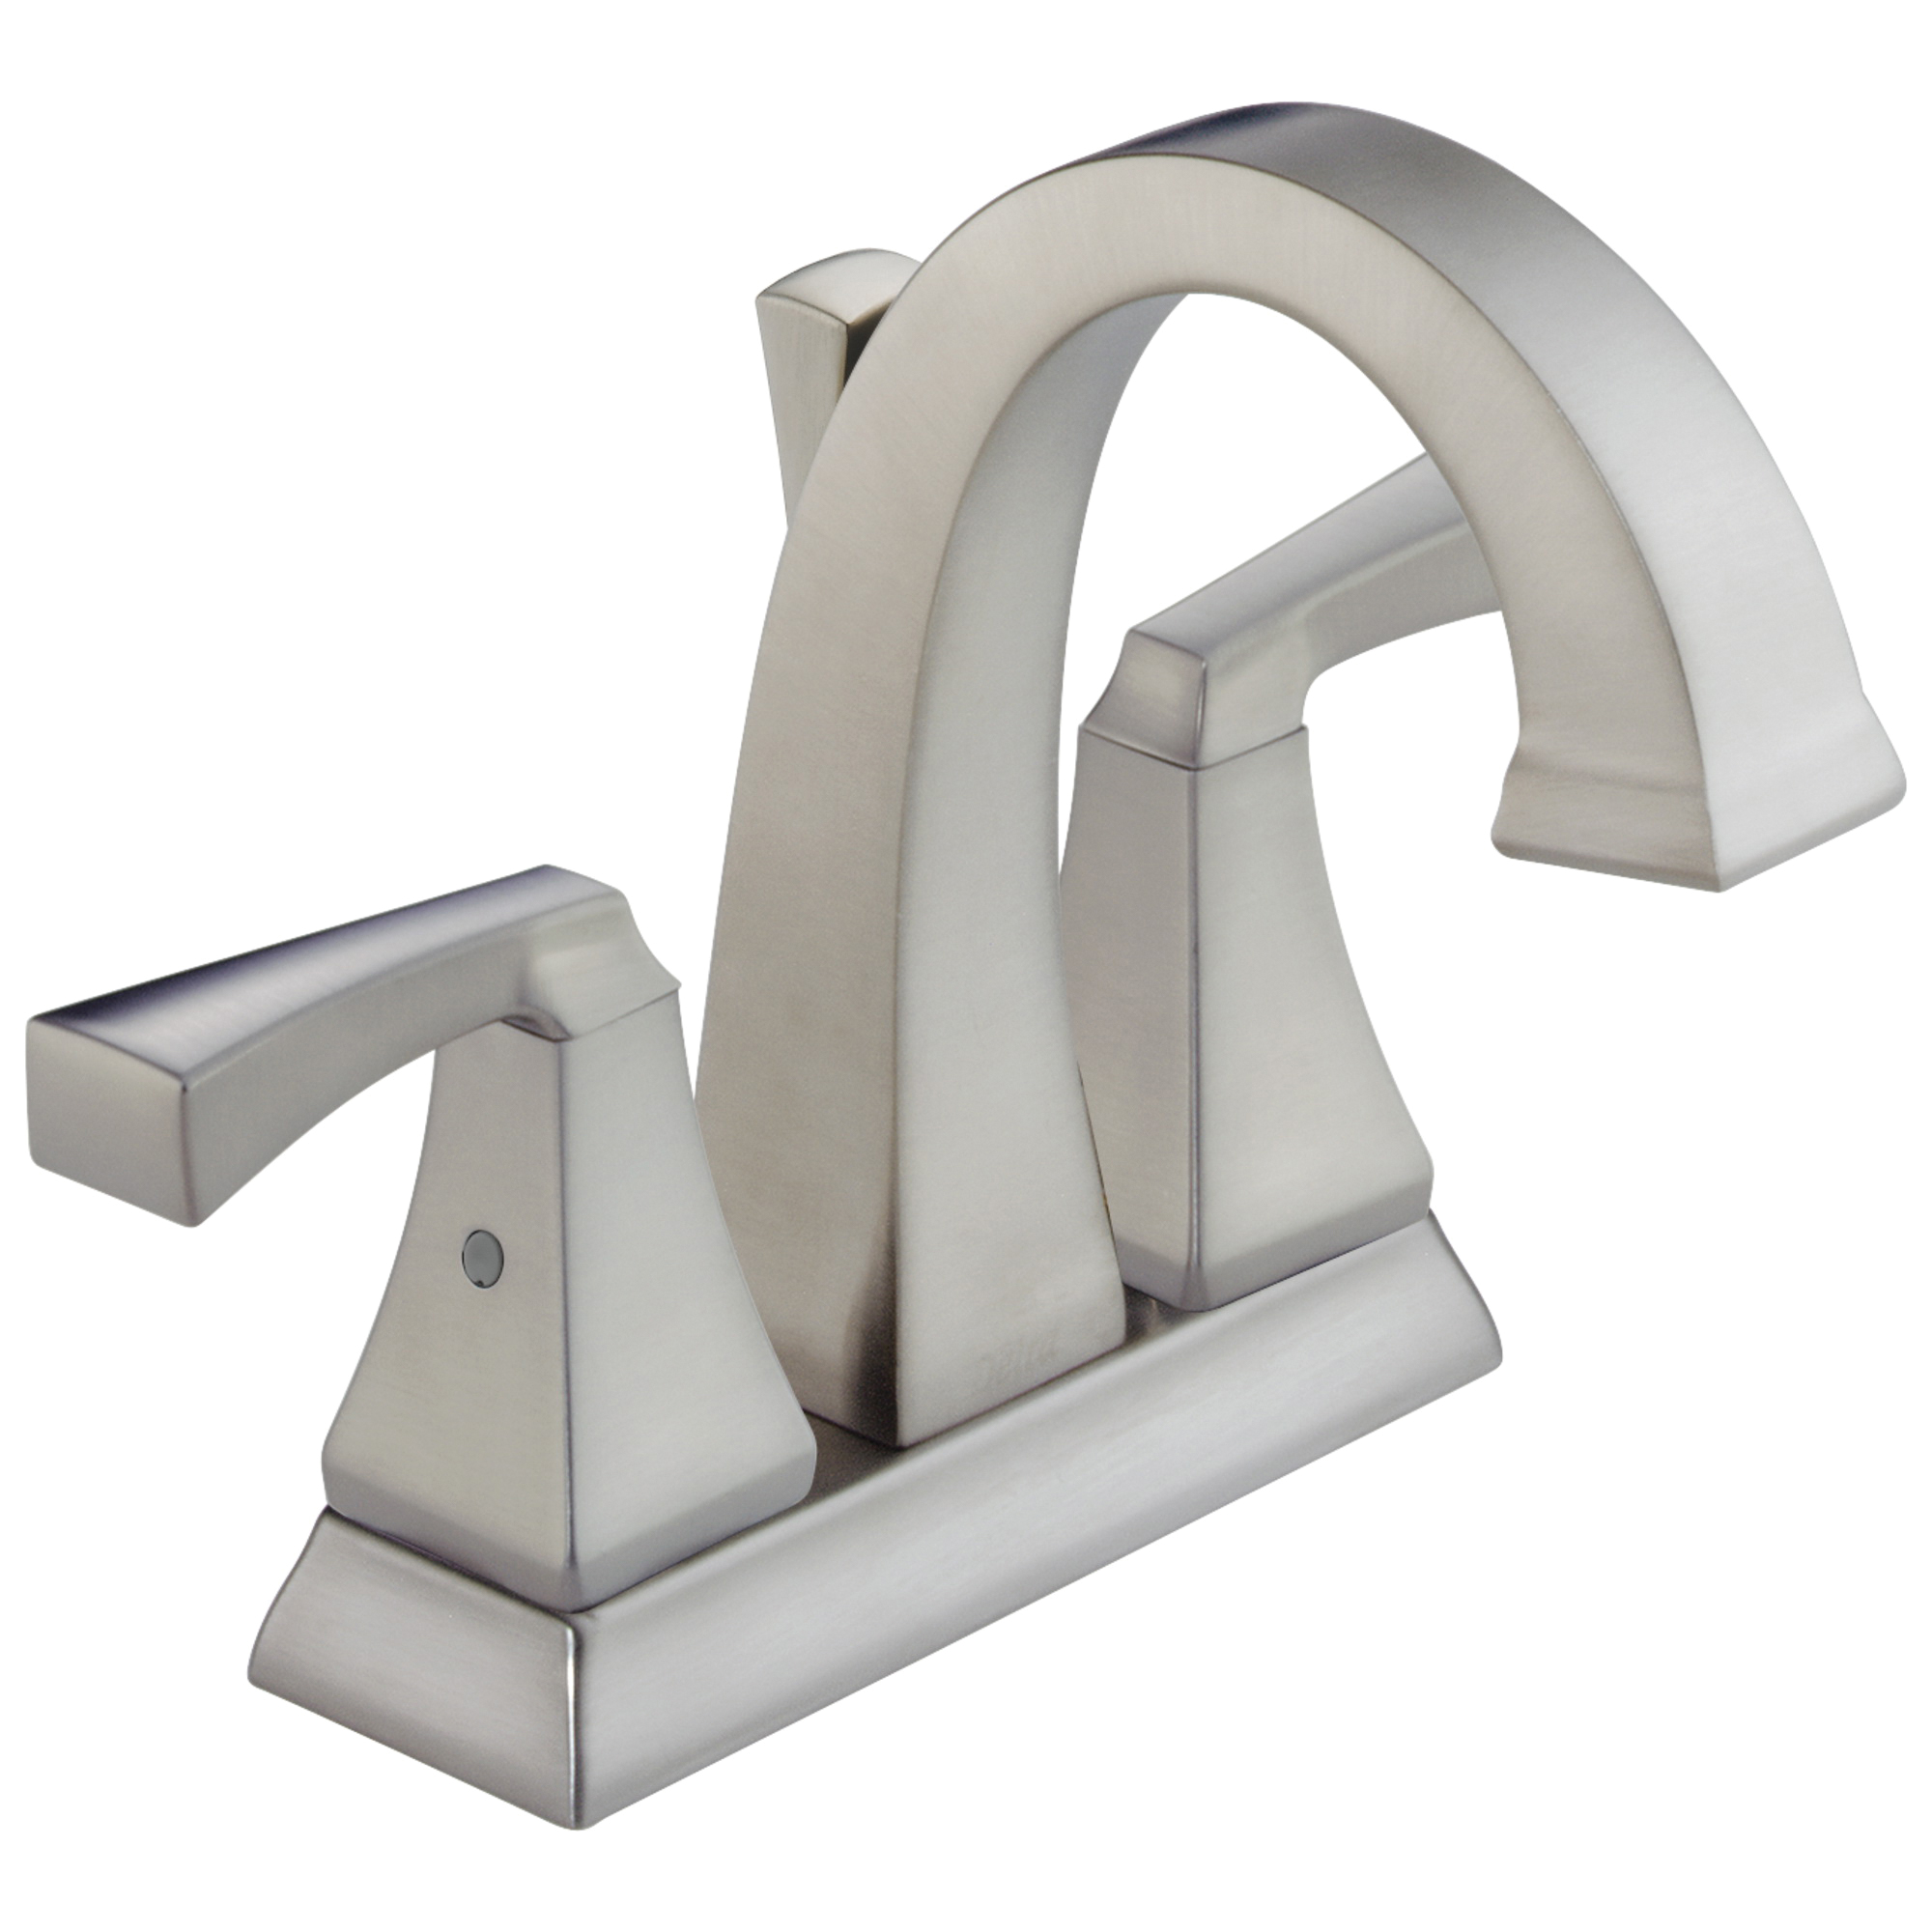 DELTA® 2551-SSMPU-DST Centerset Lavatory Faucet, Dryden™, Stainless Steel, 2 Handles, Metal Pop-Up Drain, 1.2 gpm